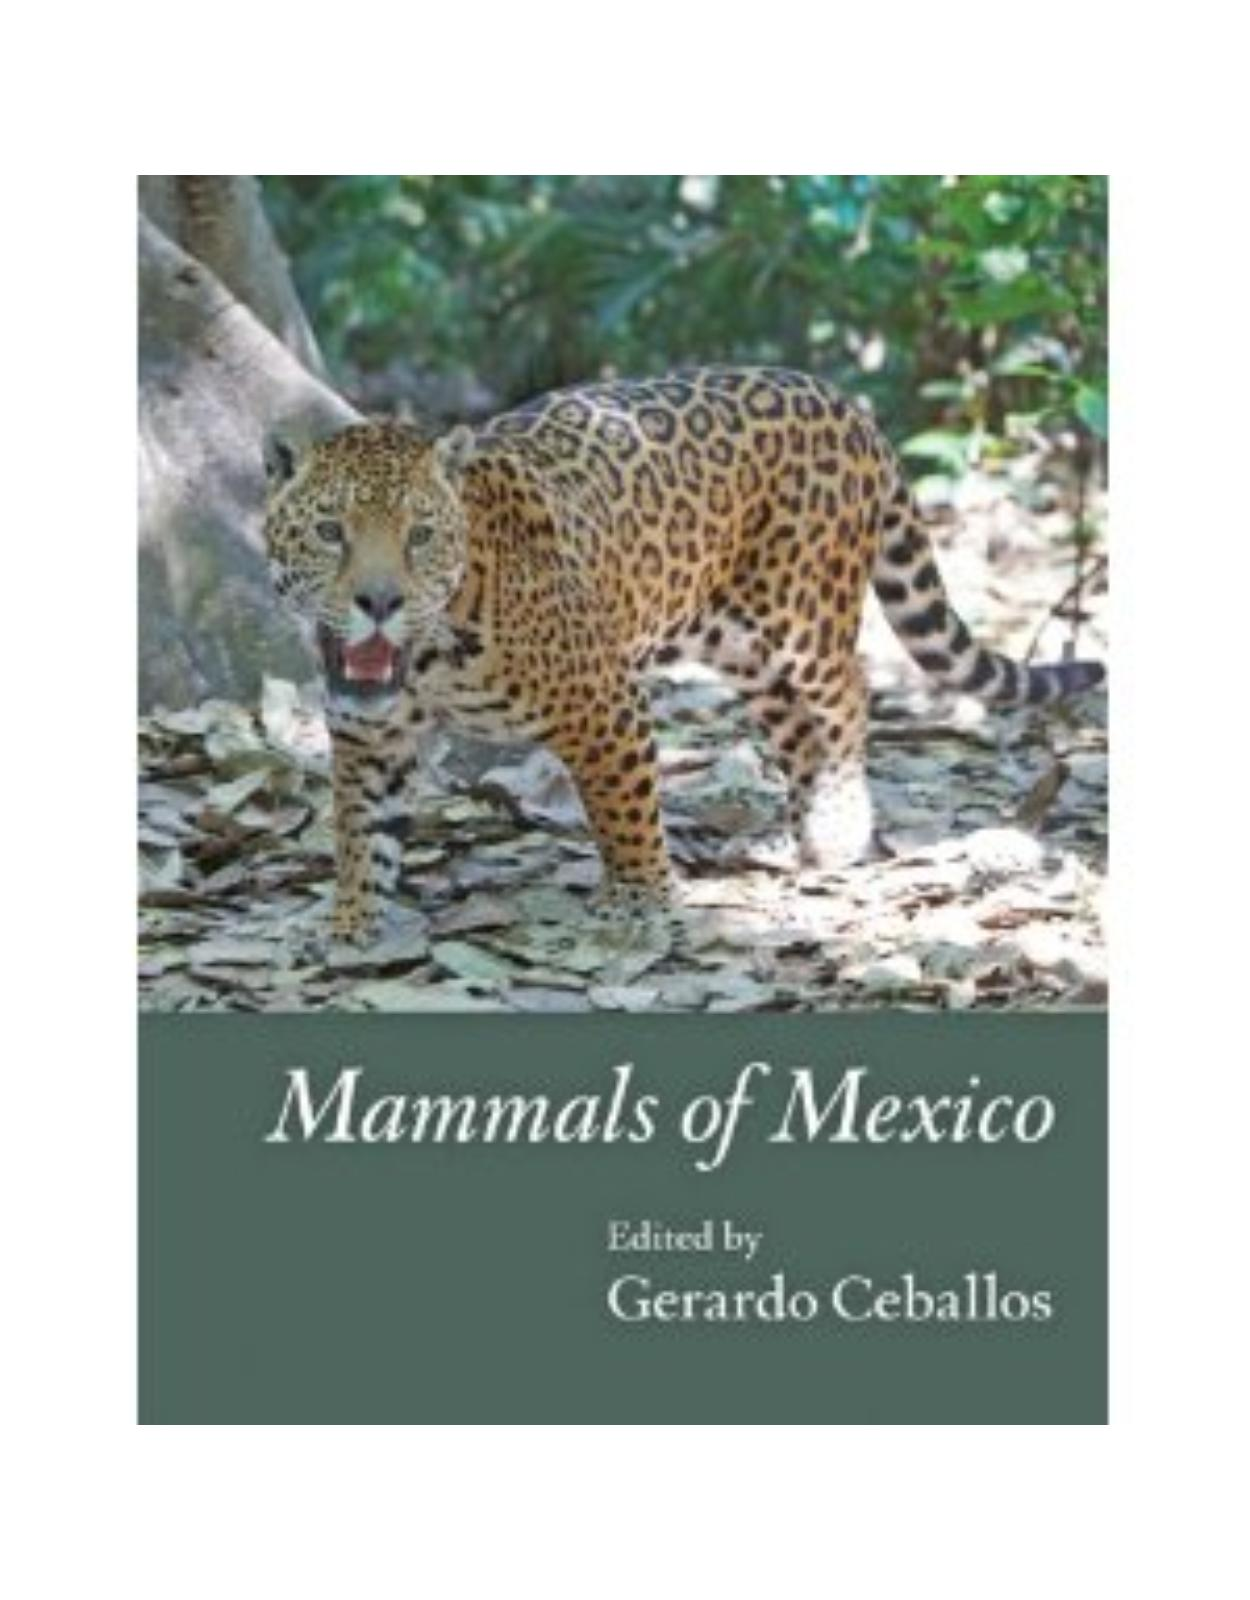 Mammals of Mexico.